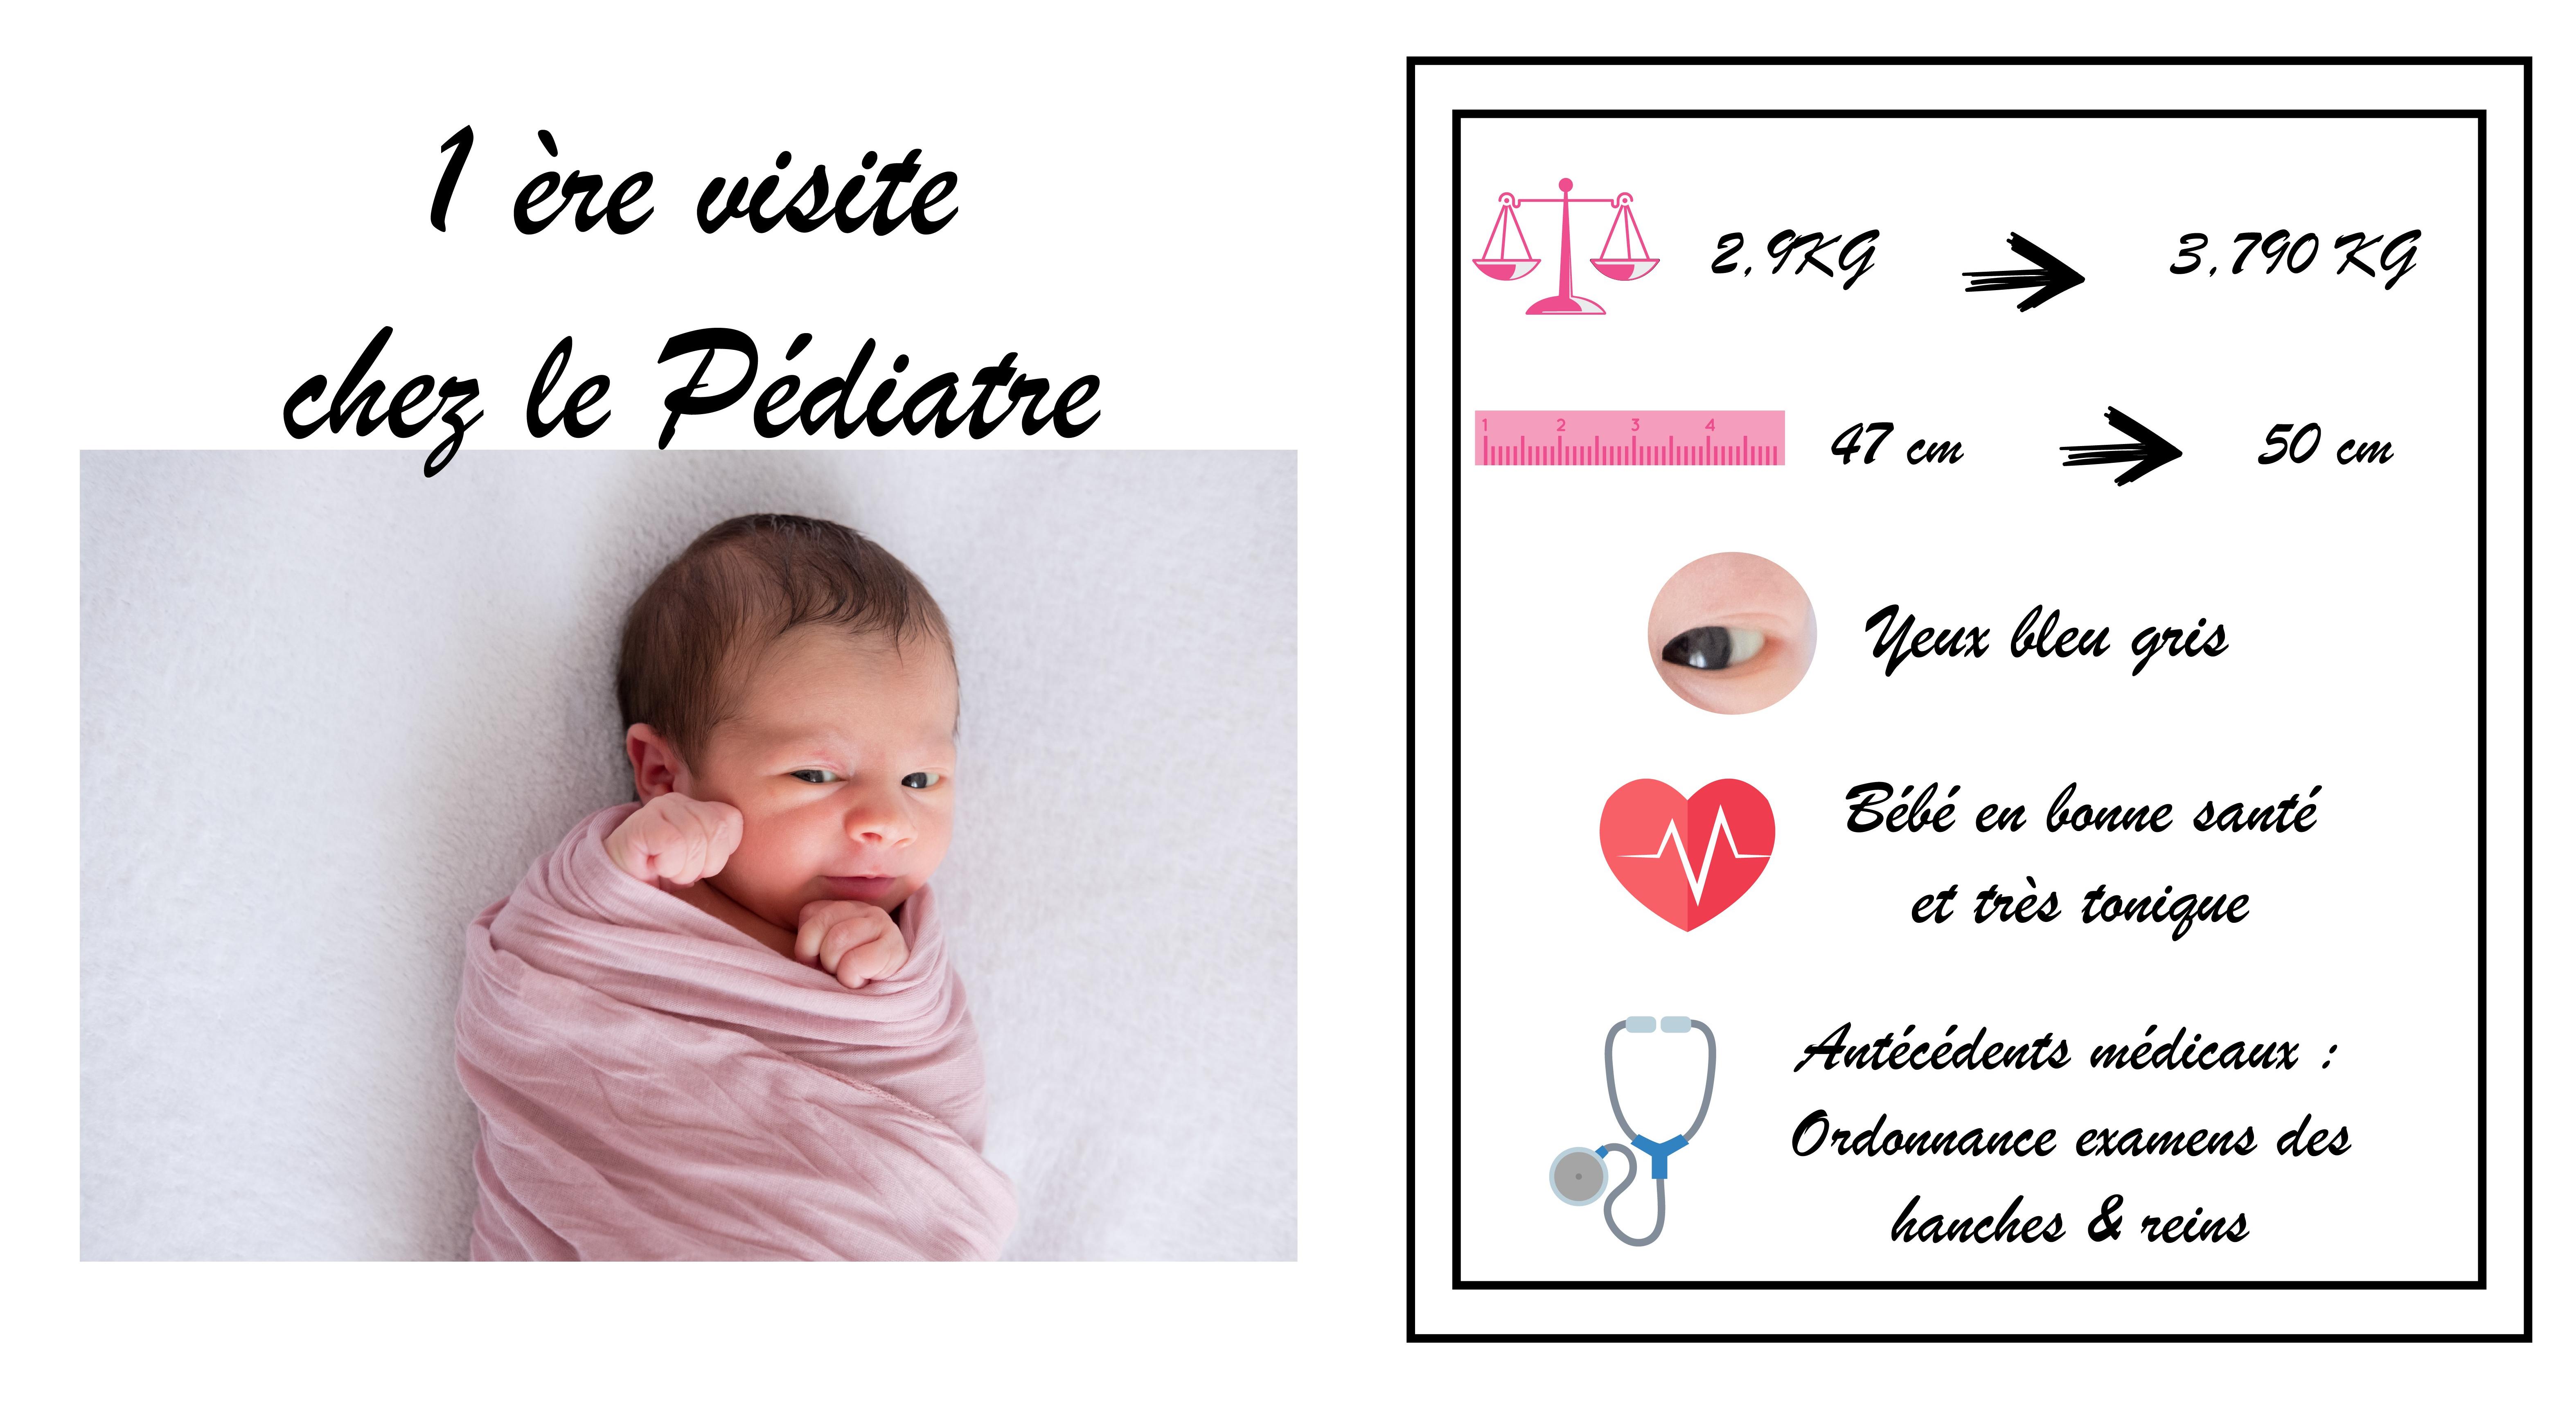 1ere-visite-chez-le-pediatre.jpg